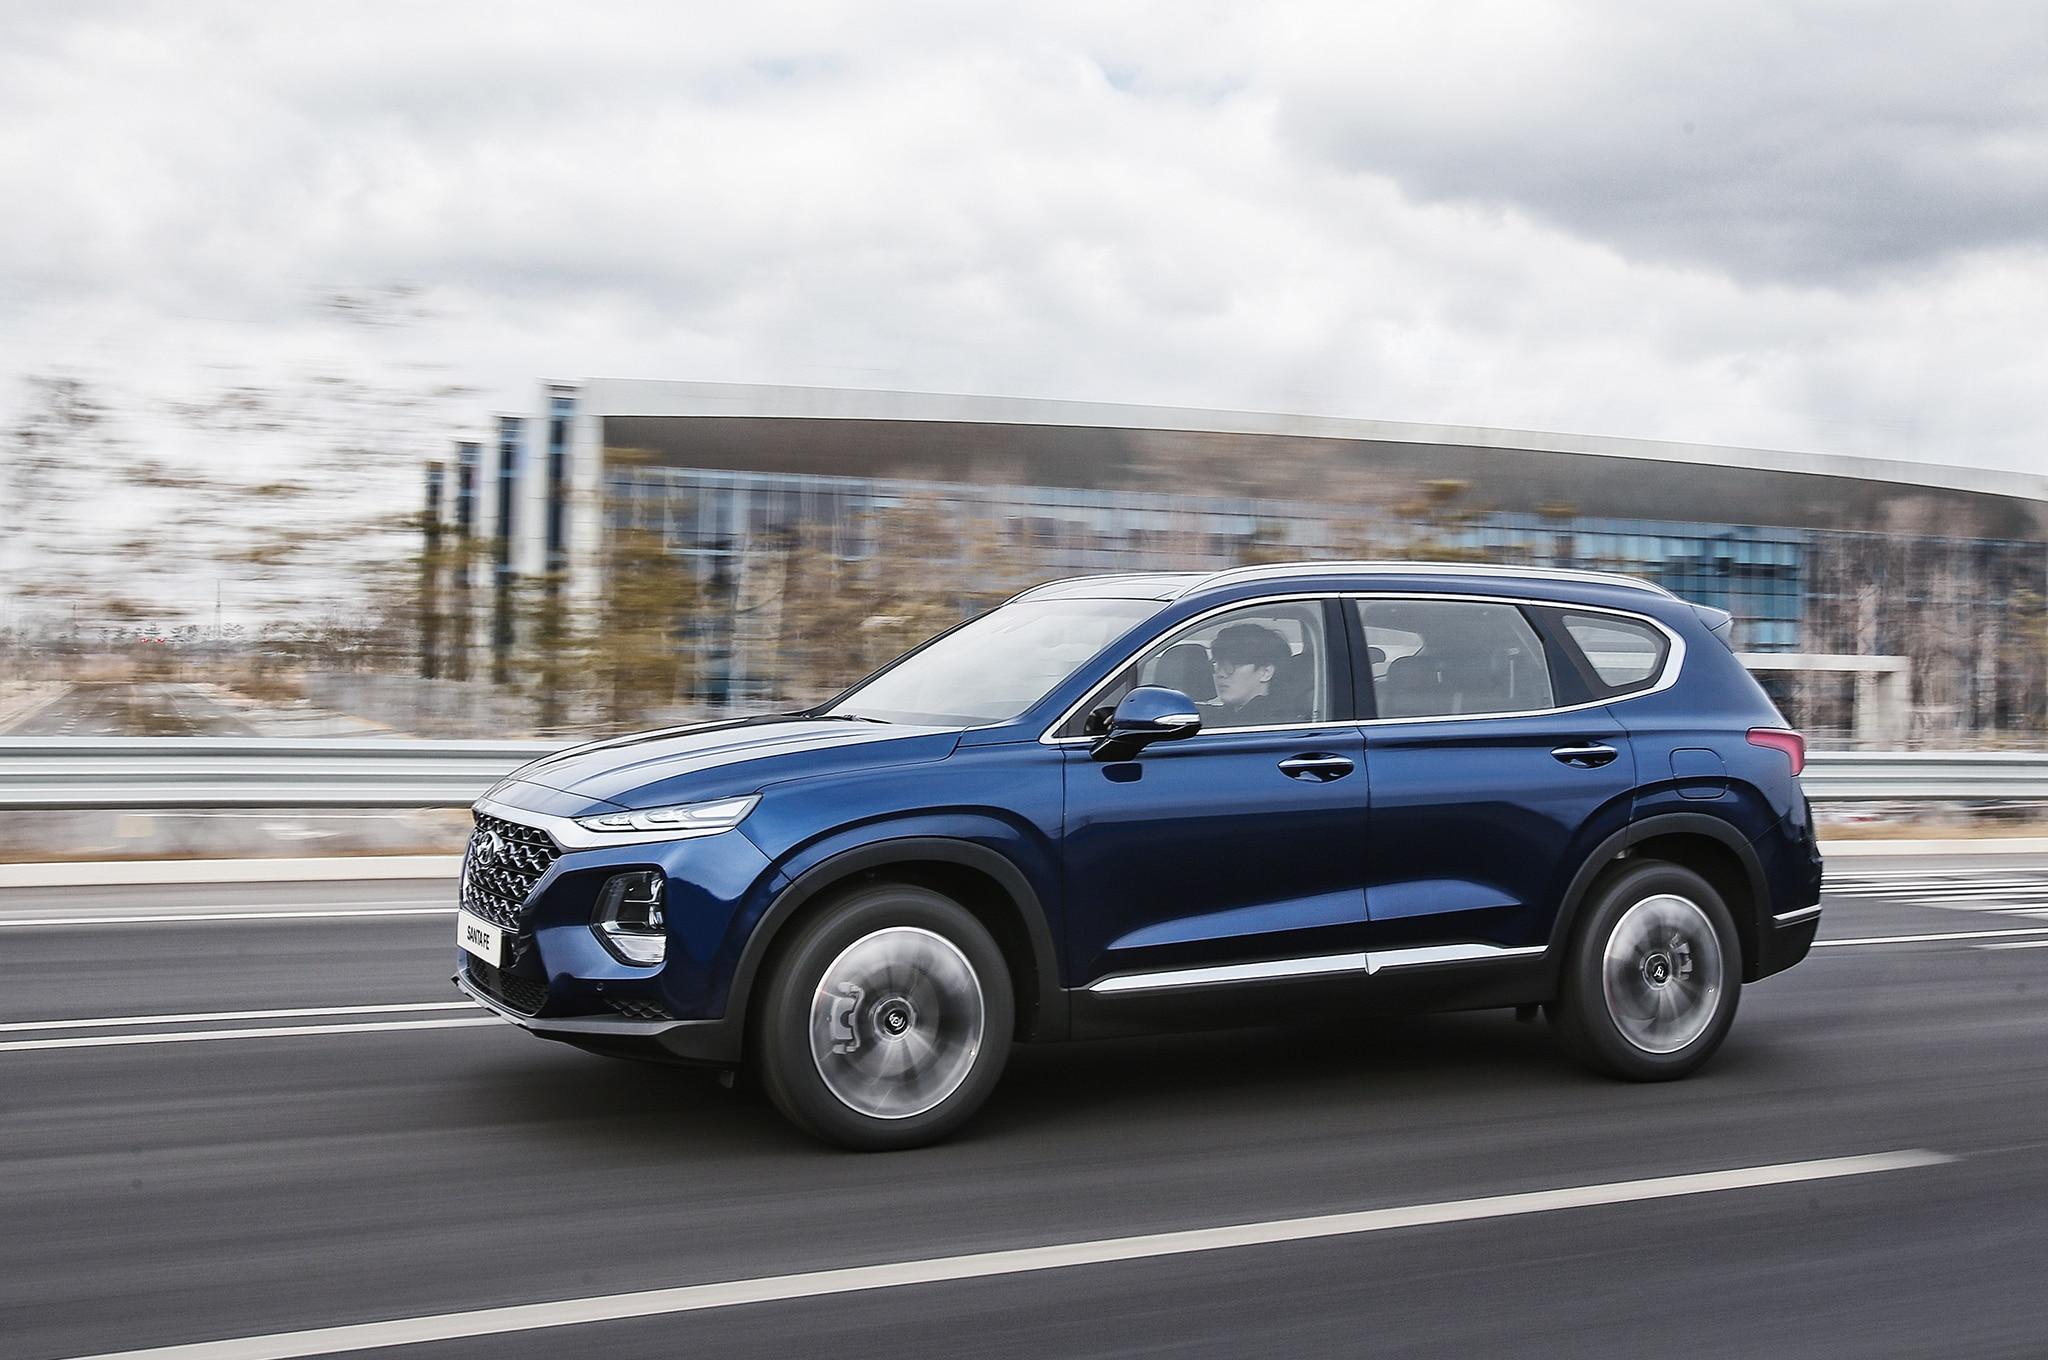 2019 Hyundai Santa Fe Korean Market Front Side In Motion 3